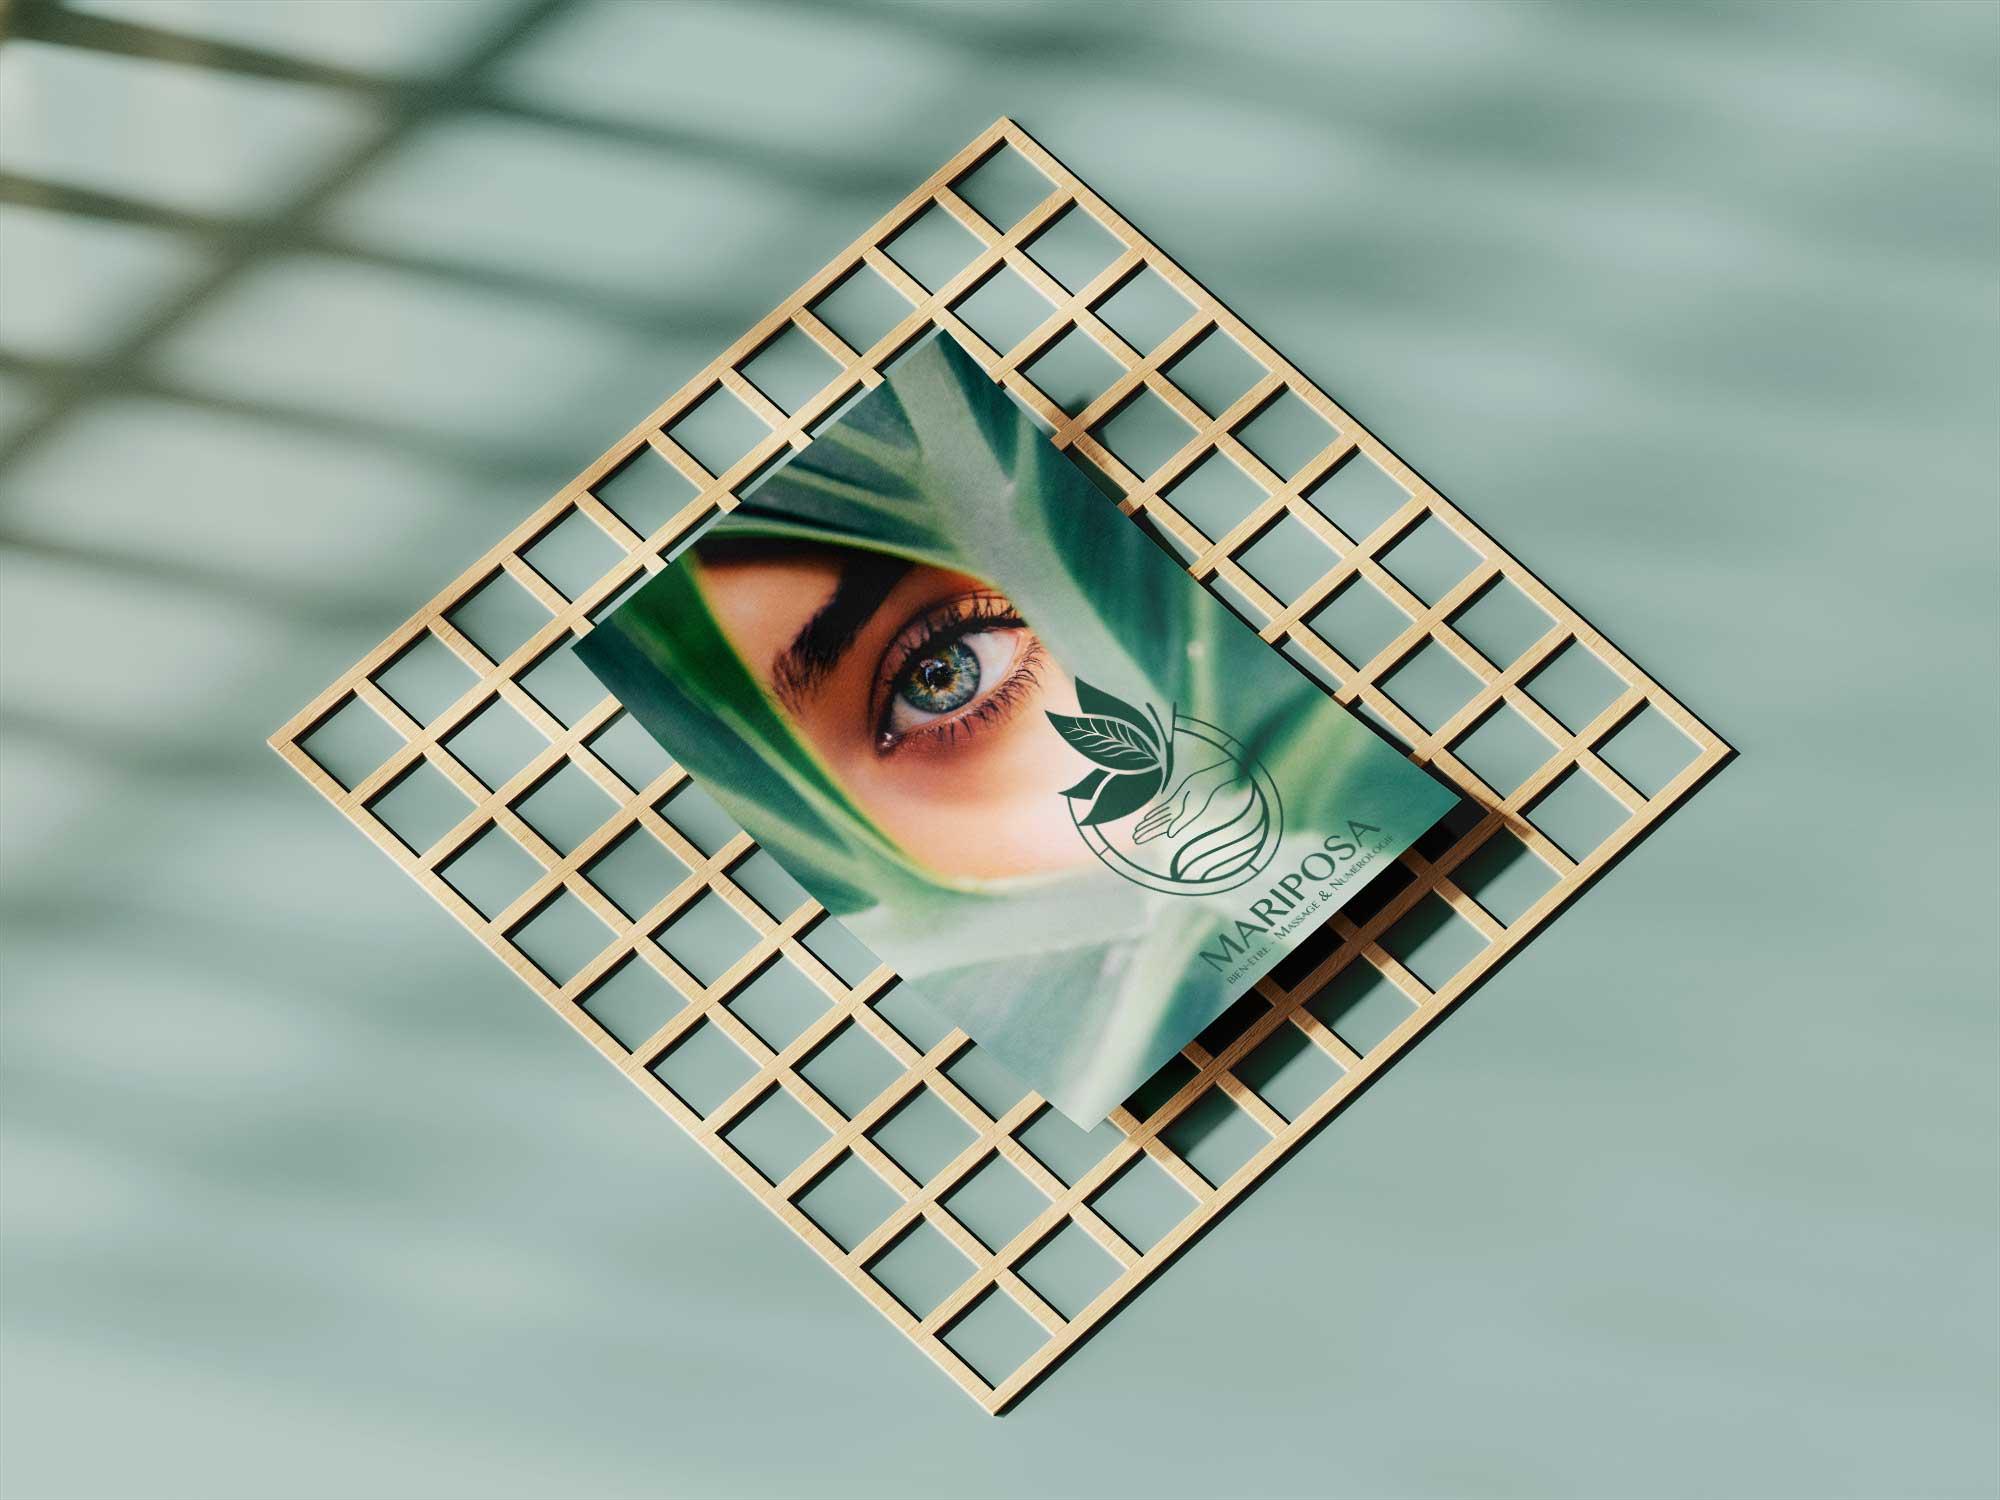 mariposa-capbreton-bienetre-numerologie-massage-skoncommunication-oeilfemme-femme